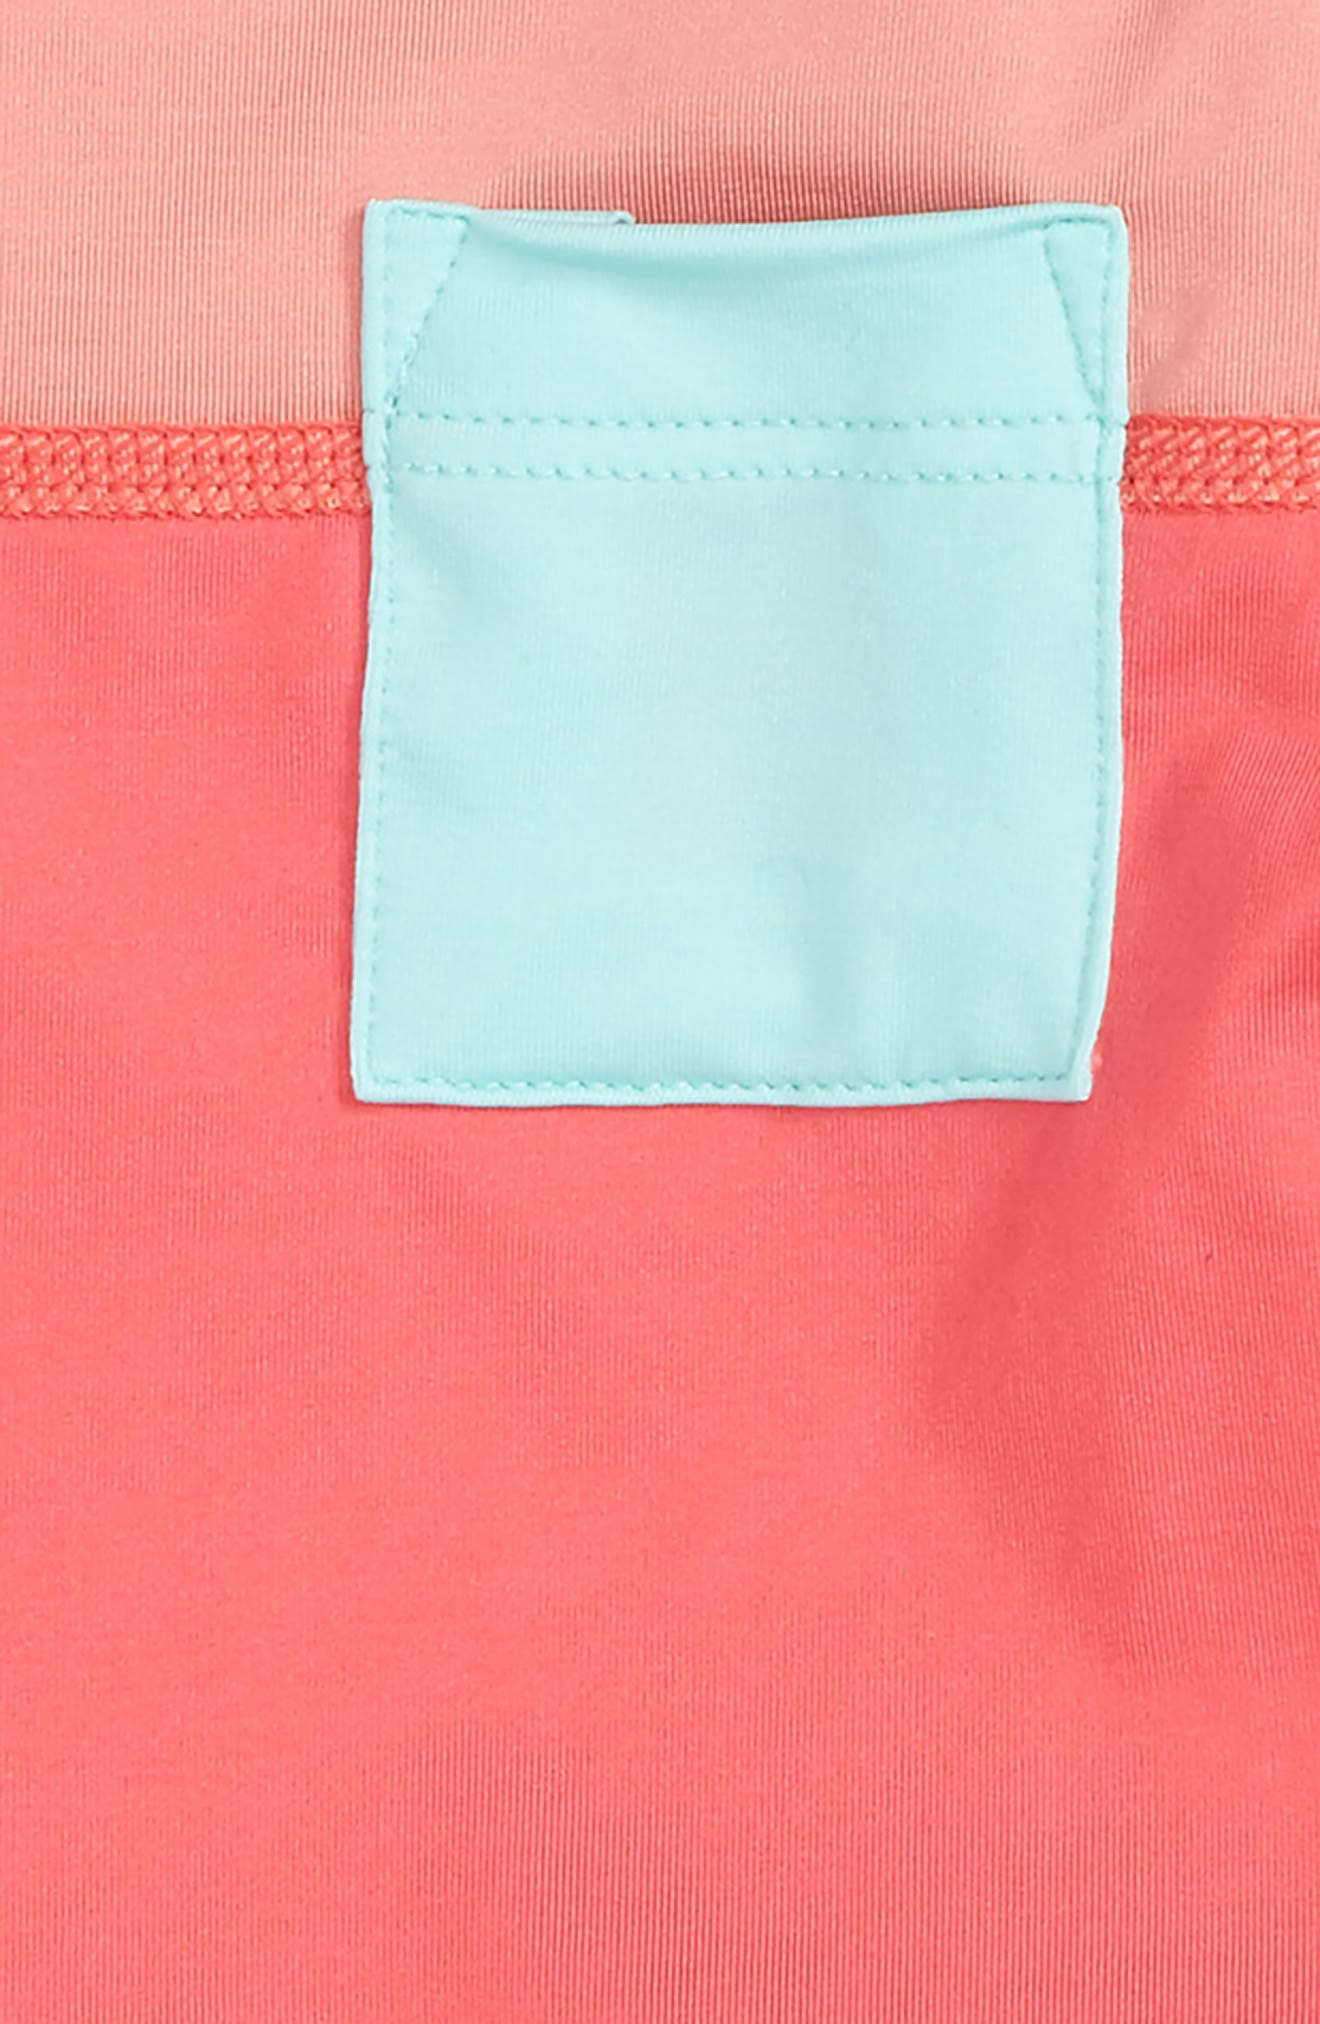 Alternate Image 2  - Patagonia 'Little Sol' Two-Piece Rashguard Swimsuit (Baby Girls)